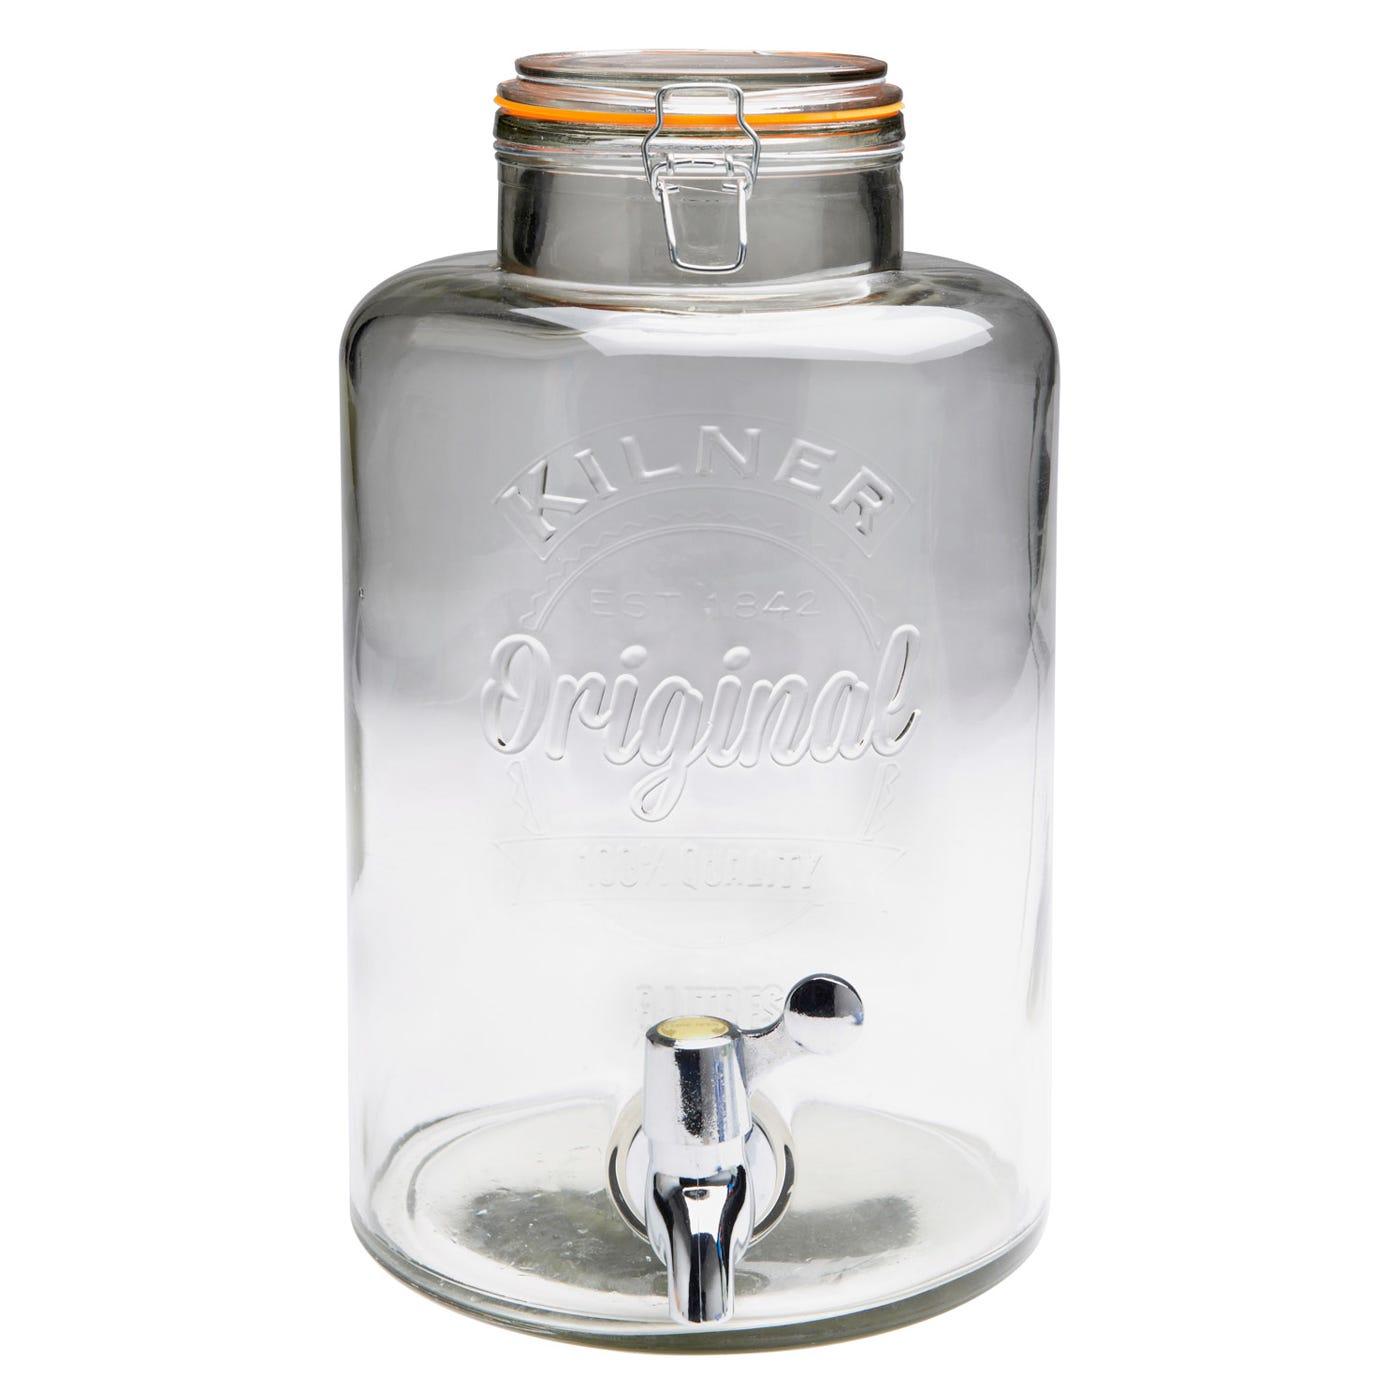 Clip Top Drinks Dispenser 8 Litre